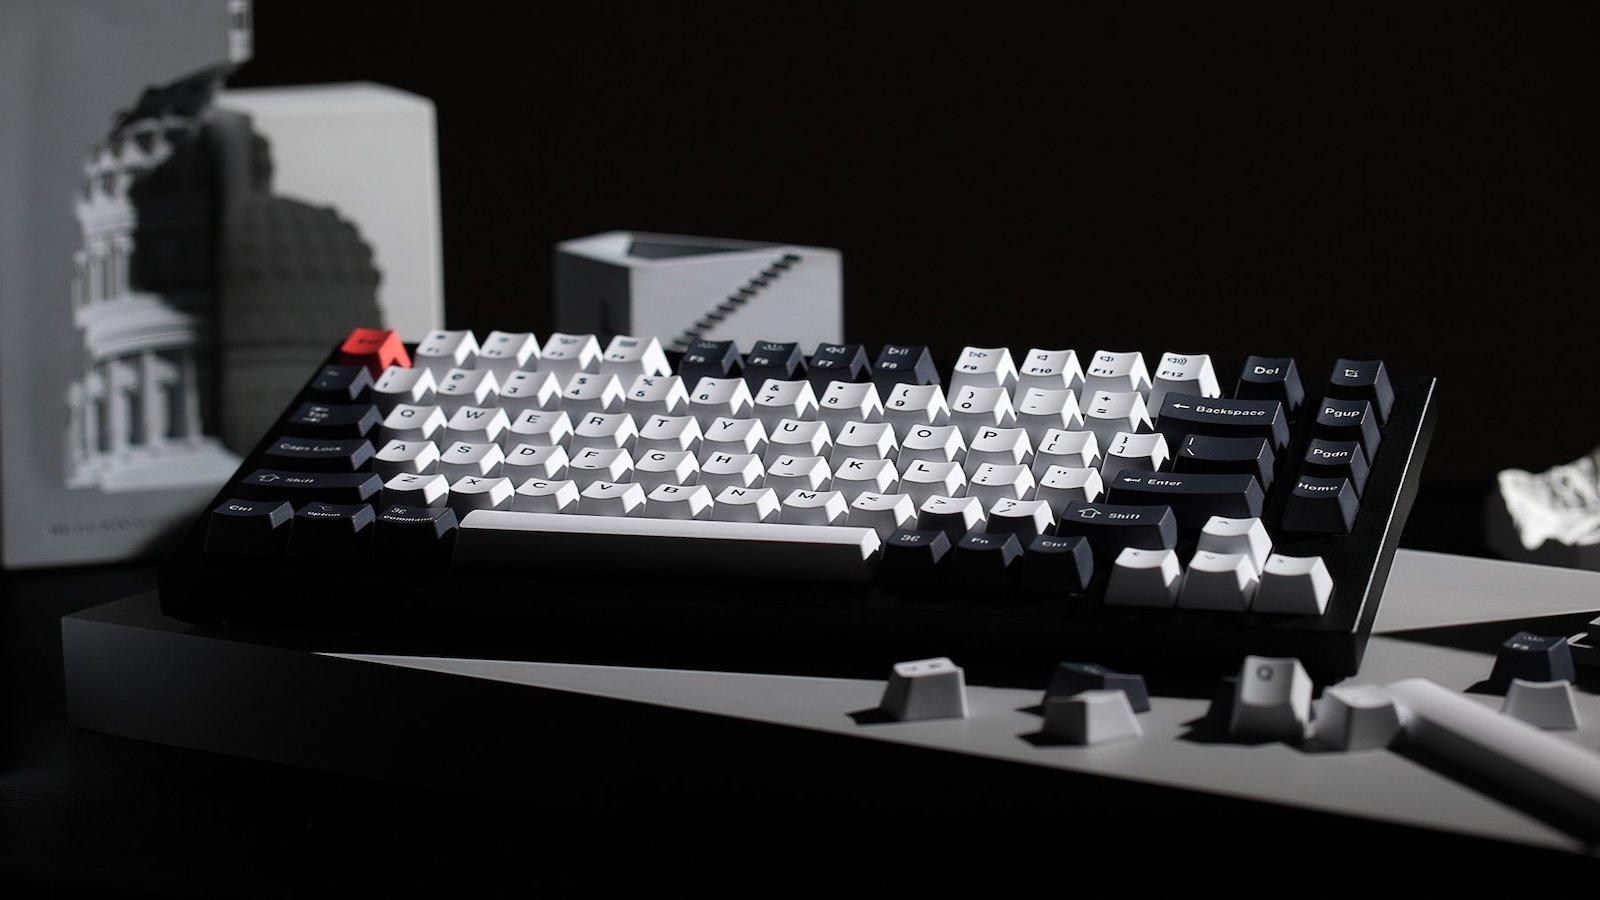 A Mechanical keyboard with a smart design - Meet Keychron Q1